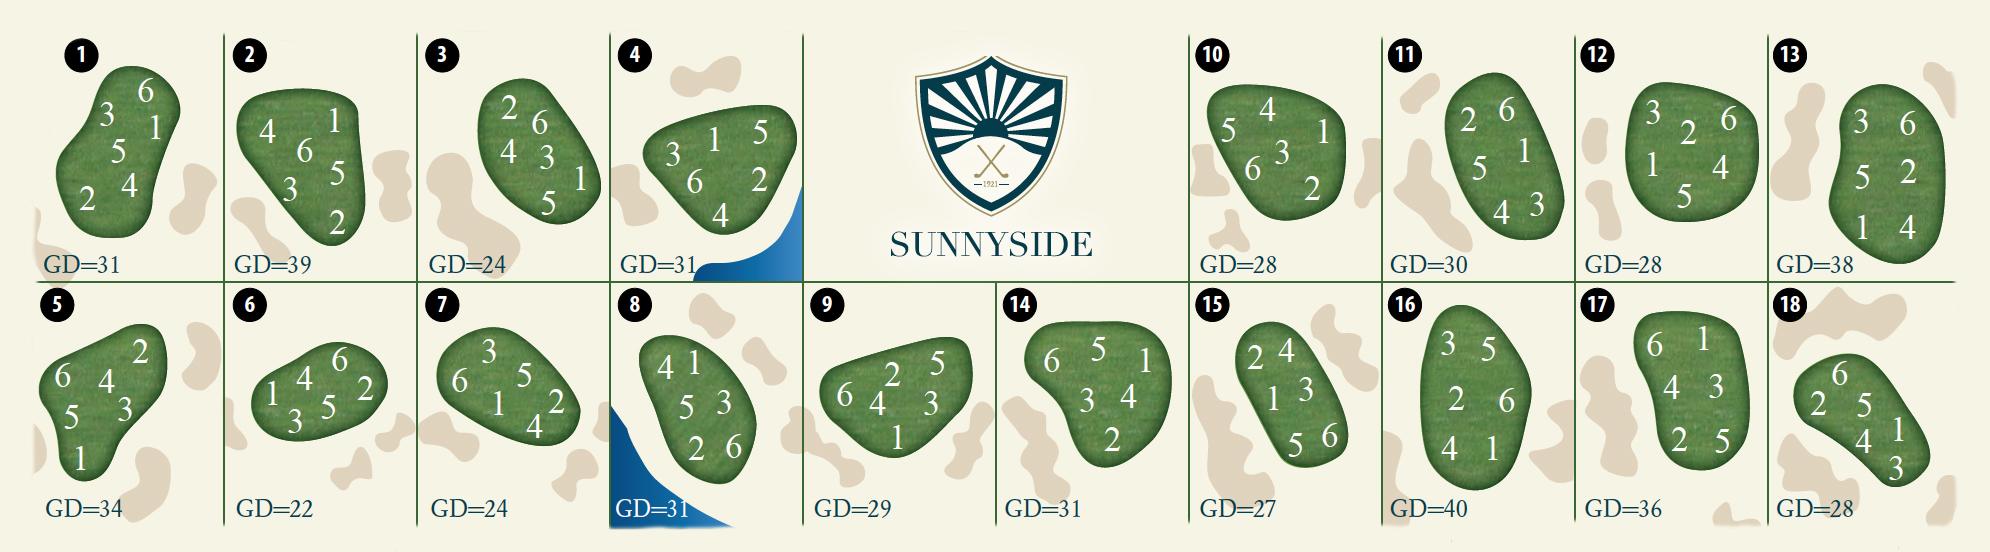 Sunnyside-Golf-and-Country-Club-Score-Card-Artwork